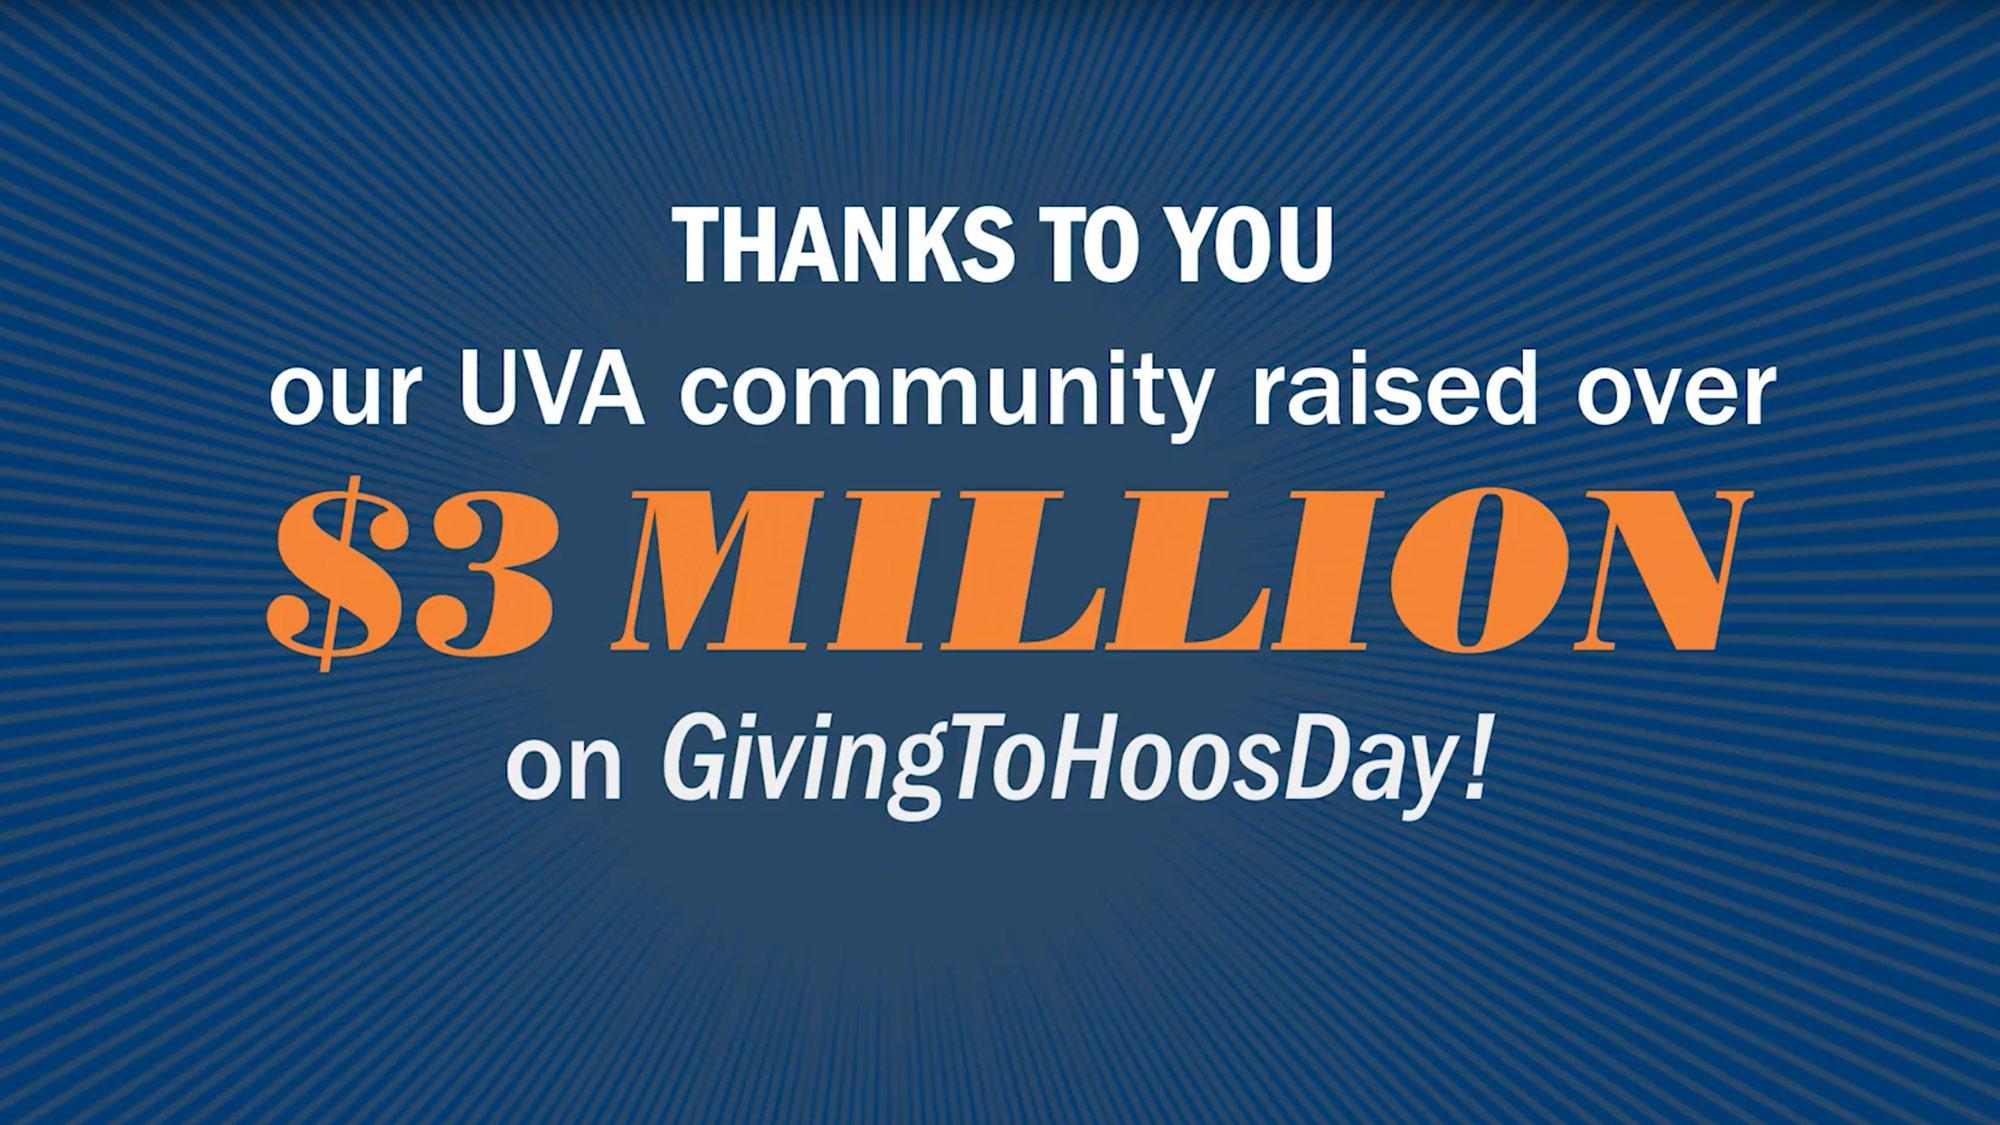 'GivingToHoosDay' Raised $3 Million in 24 Hours